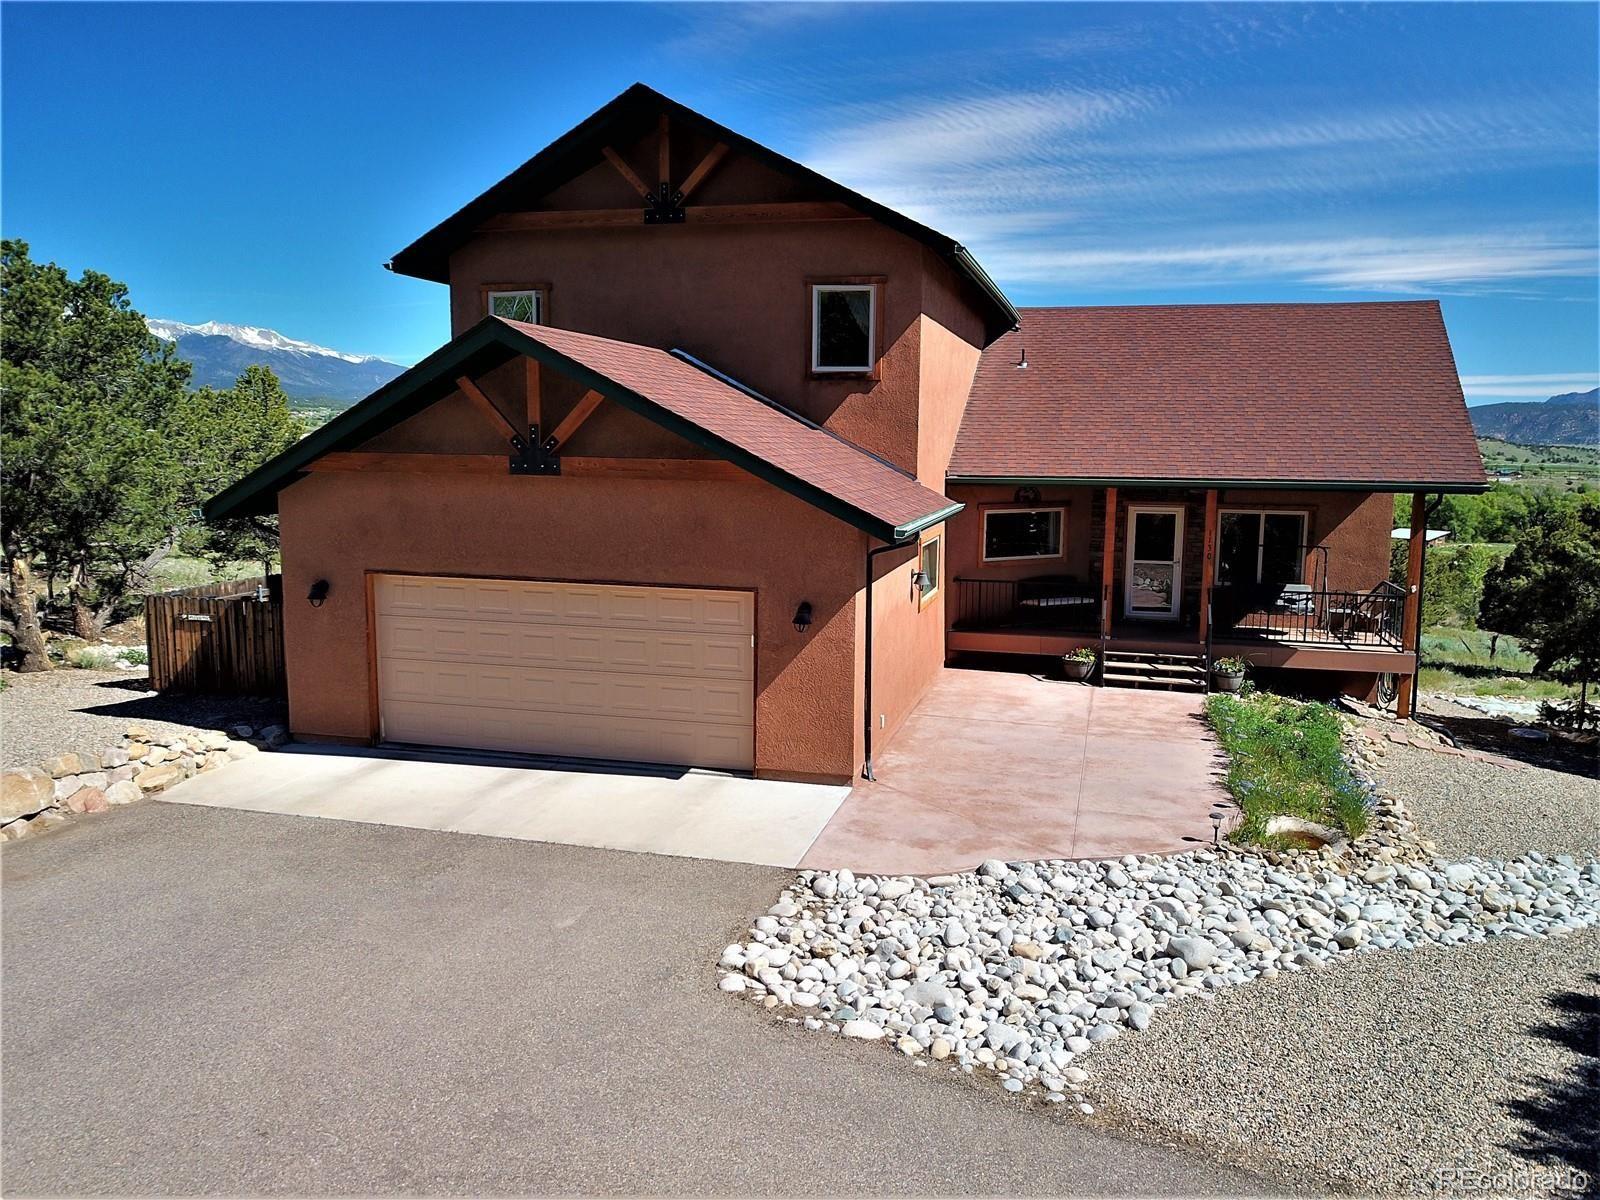 1130 Caliente Lane, Poncha Springs, CO 81242 - #: 1875908